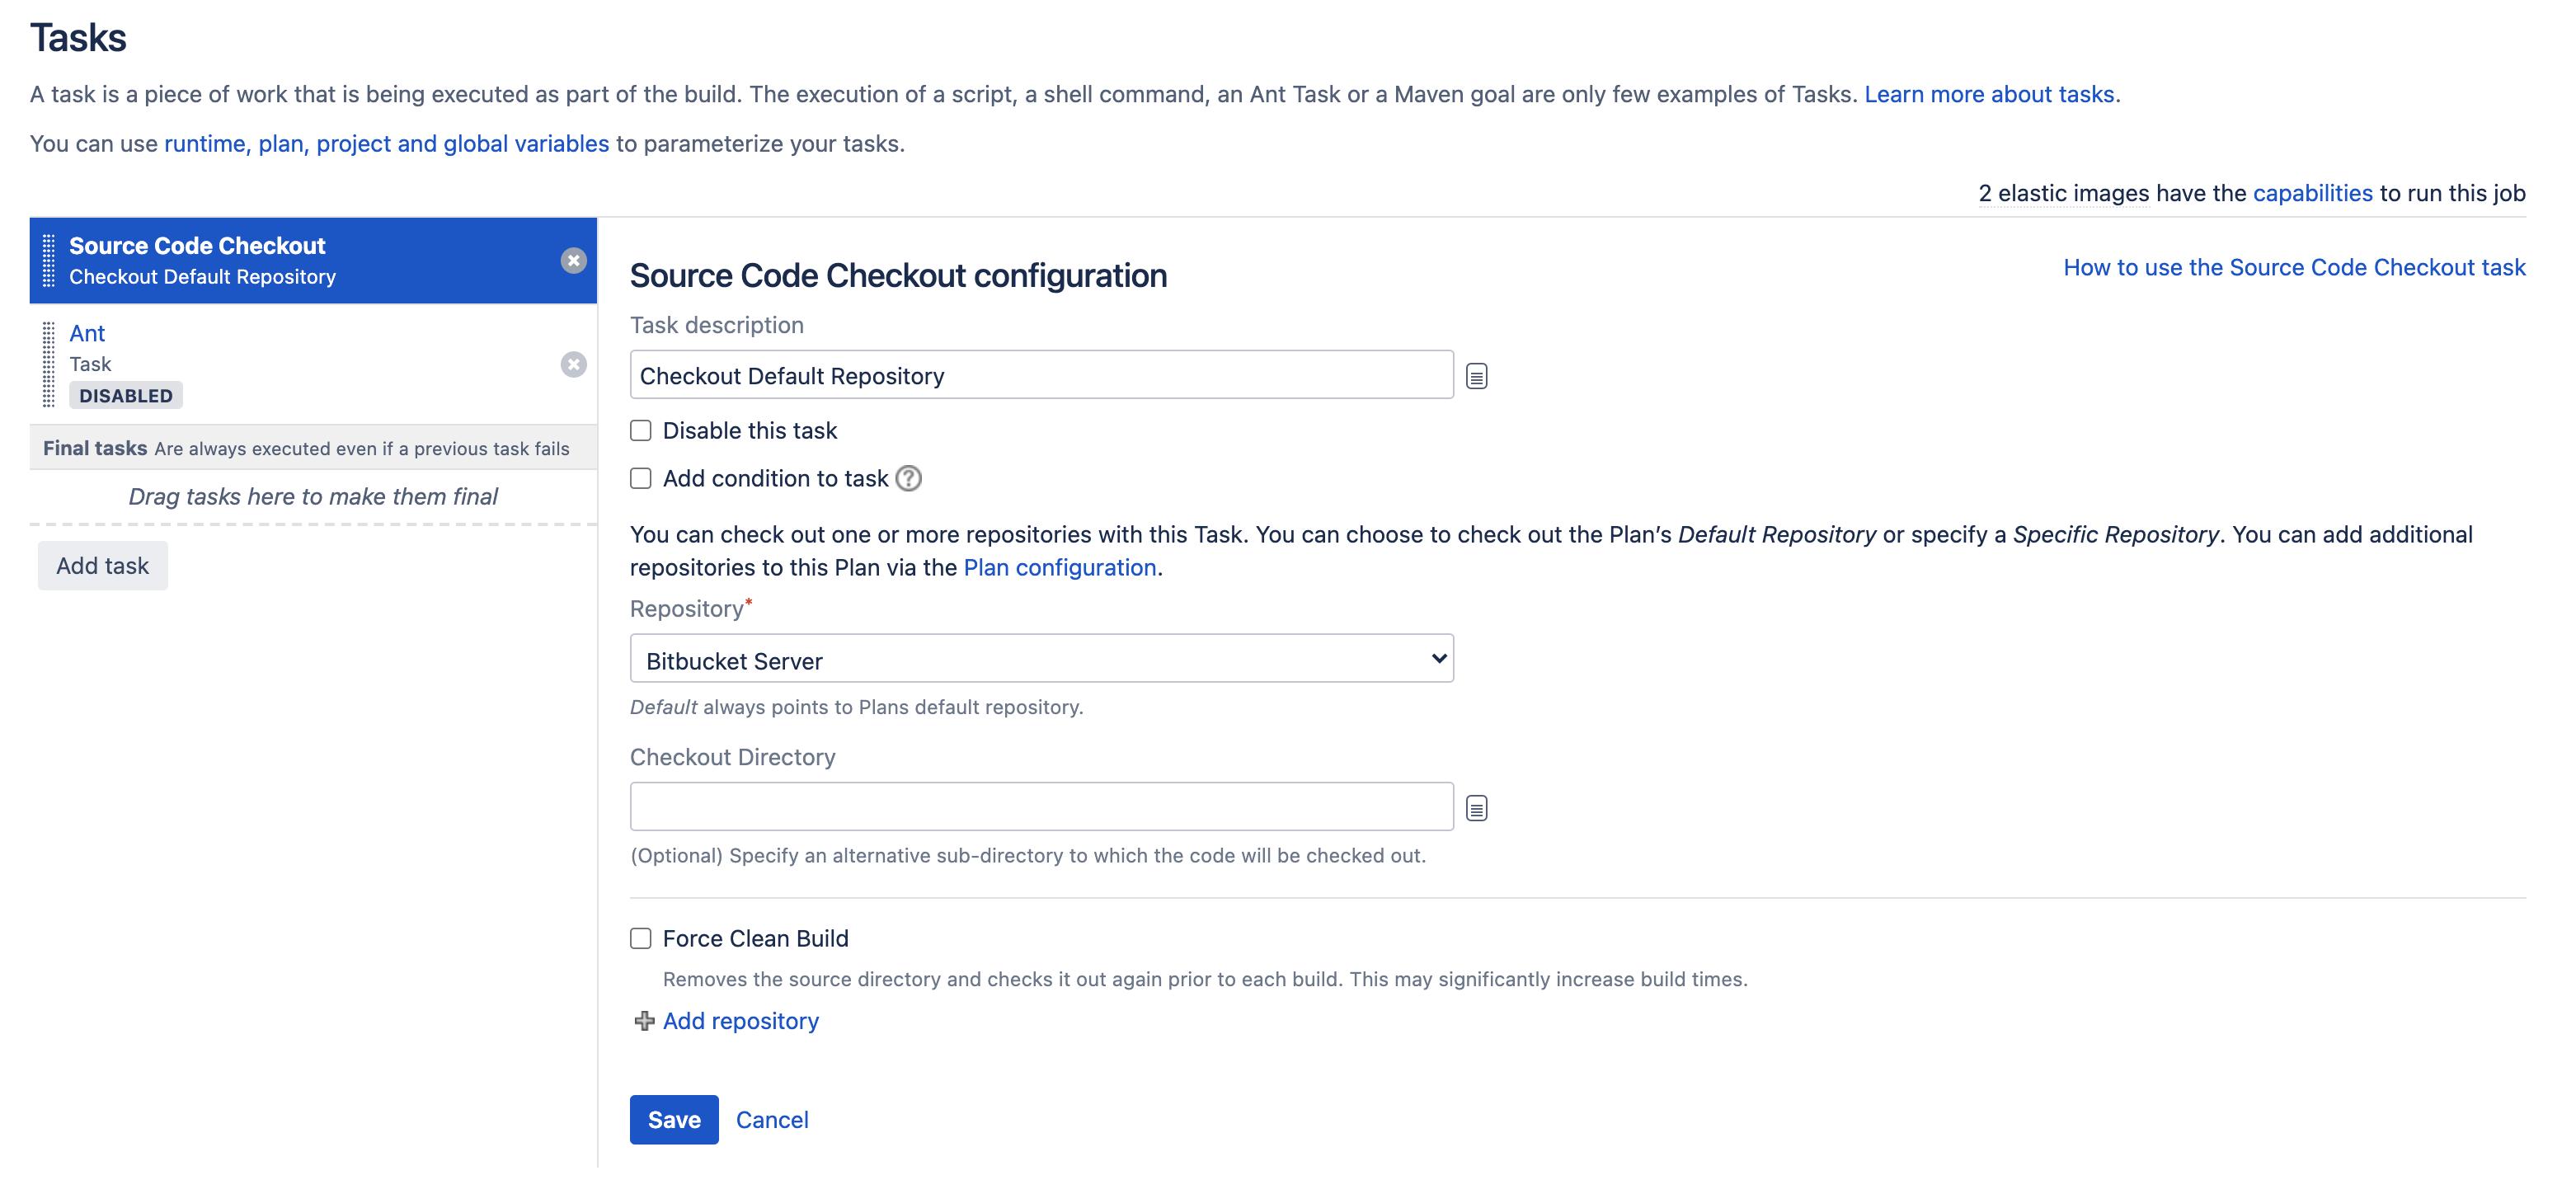 Tasks order in task configuration screen